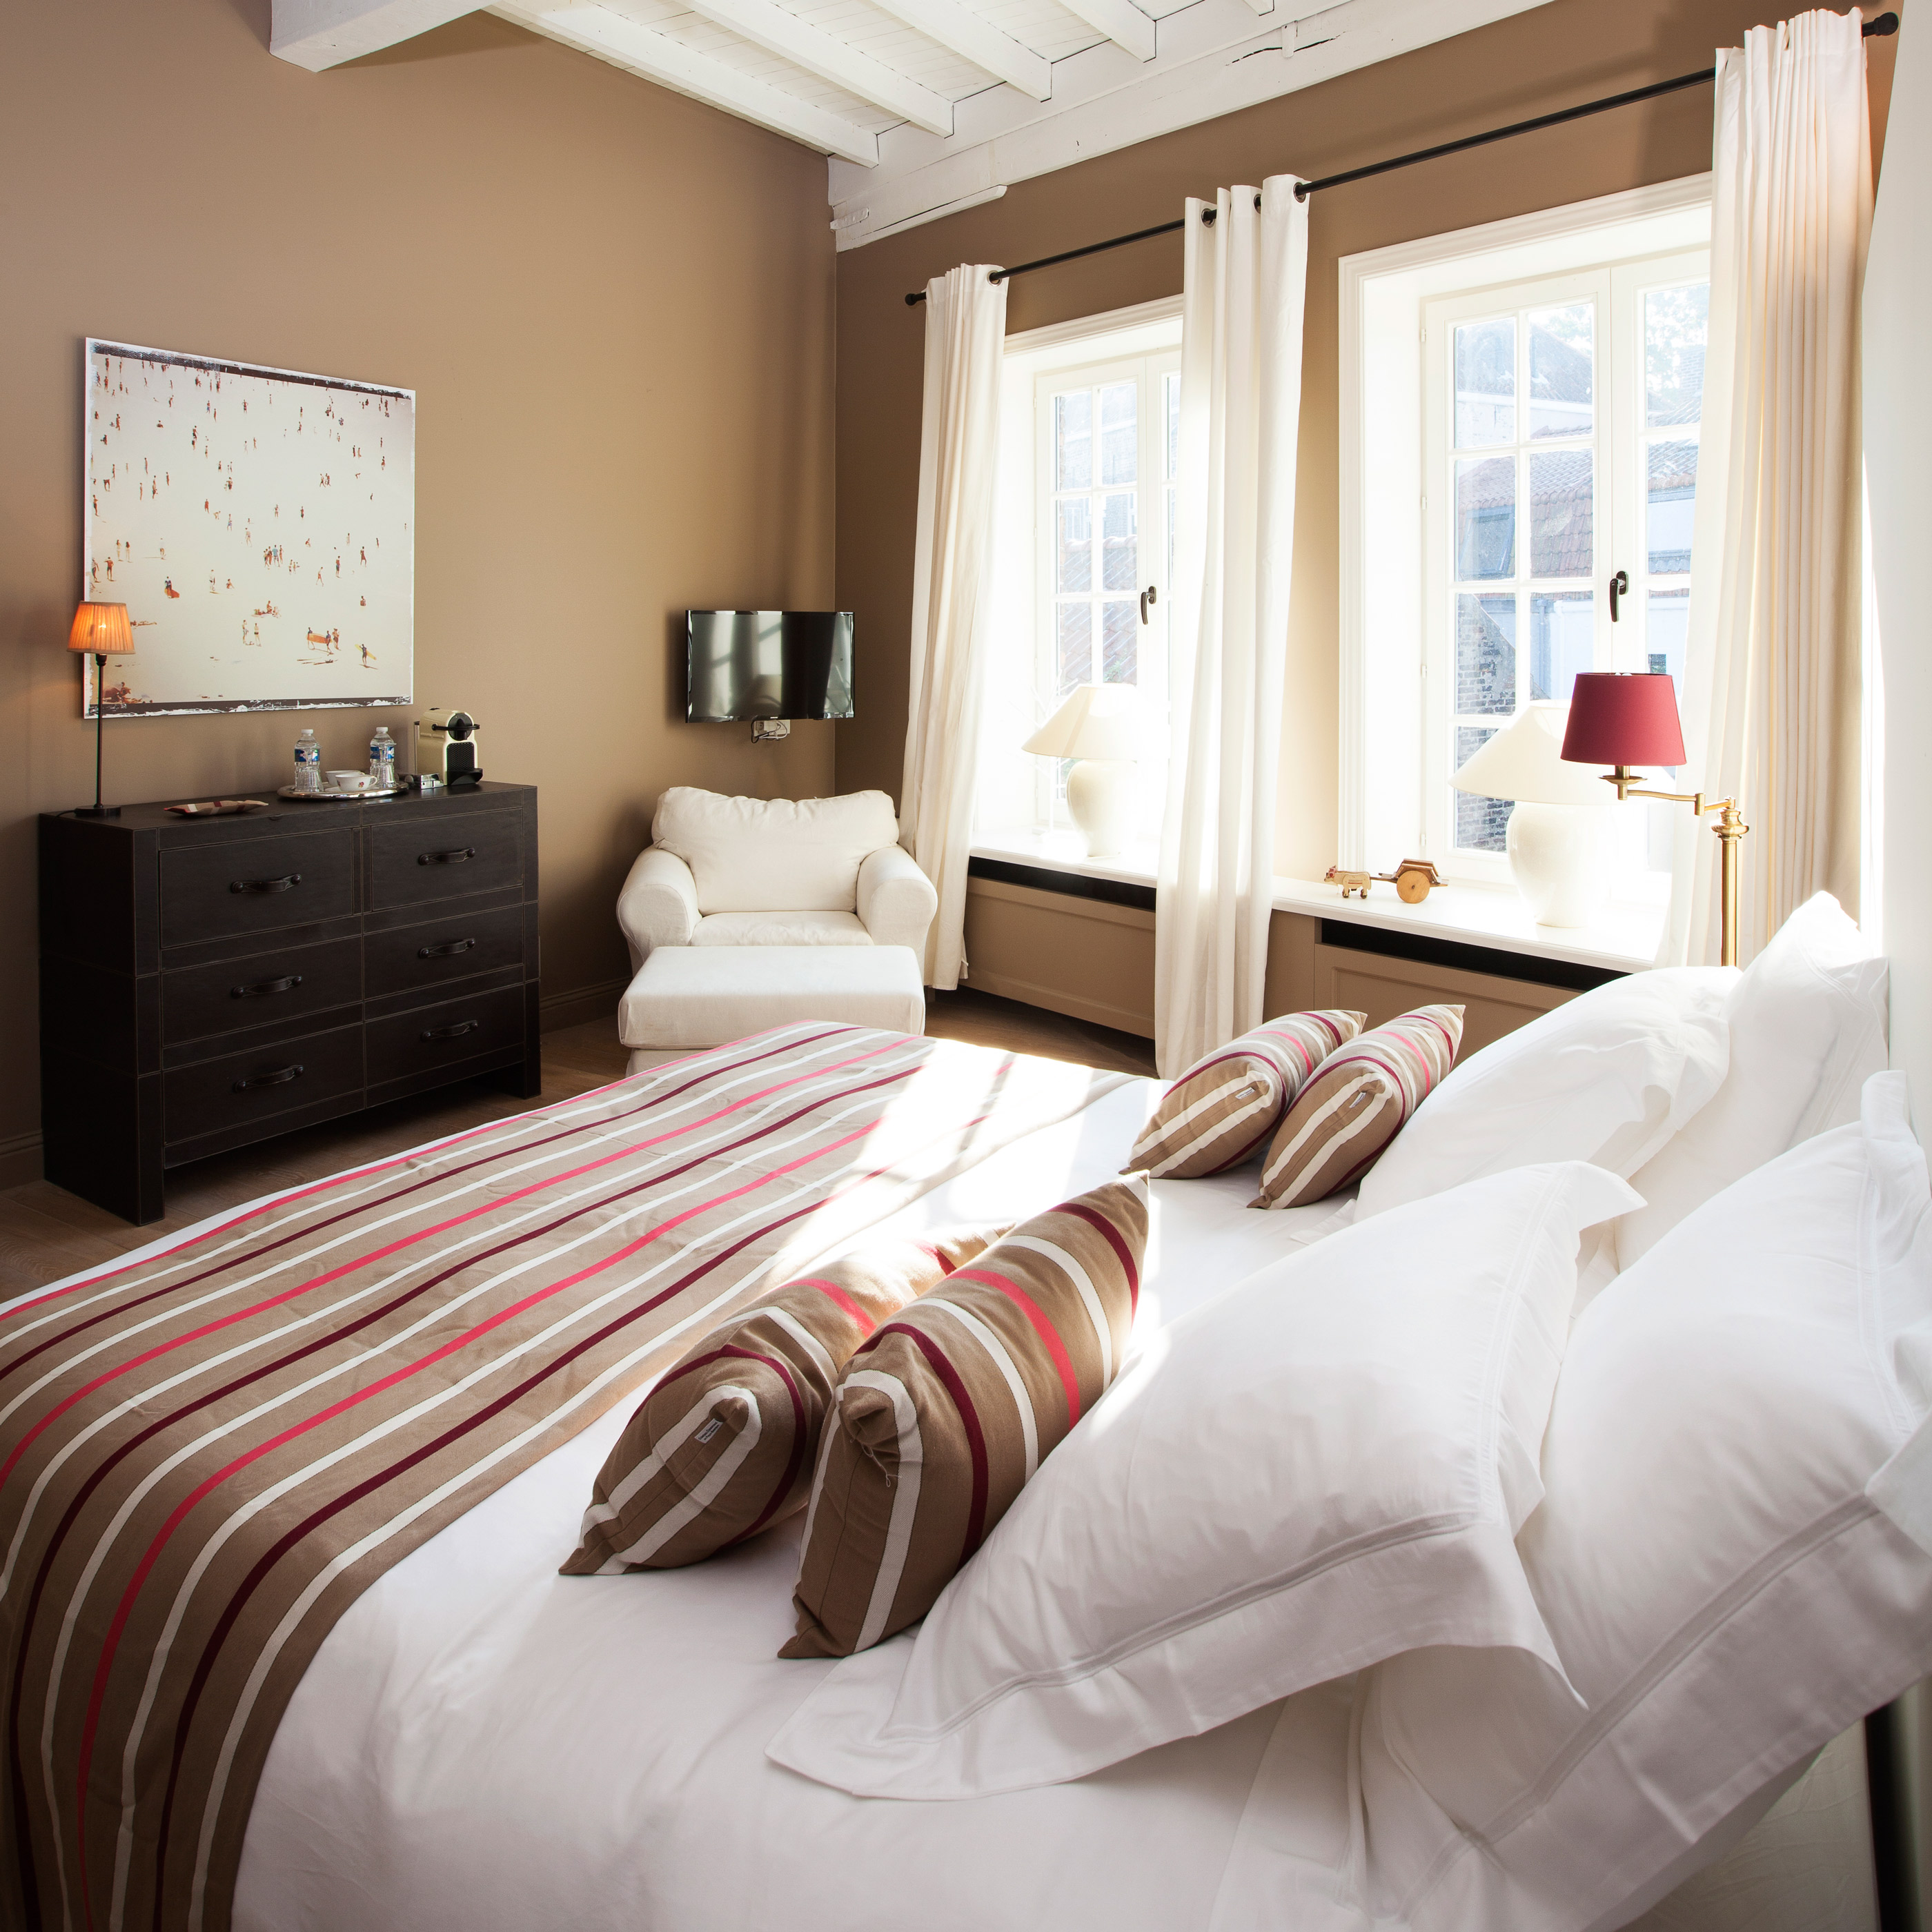 Biarritz Chambres Maison Amodio B&B